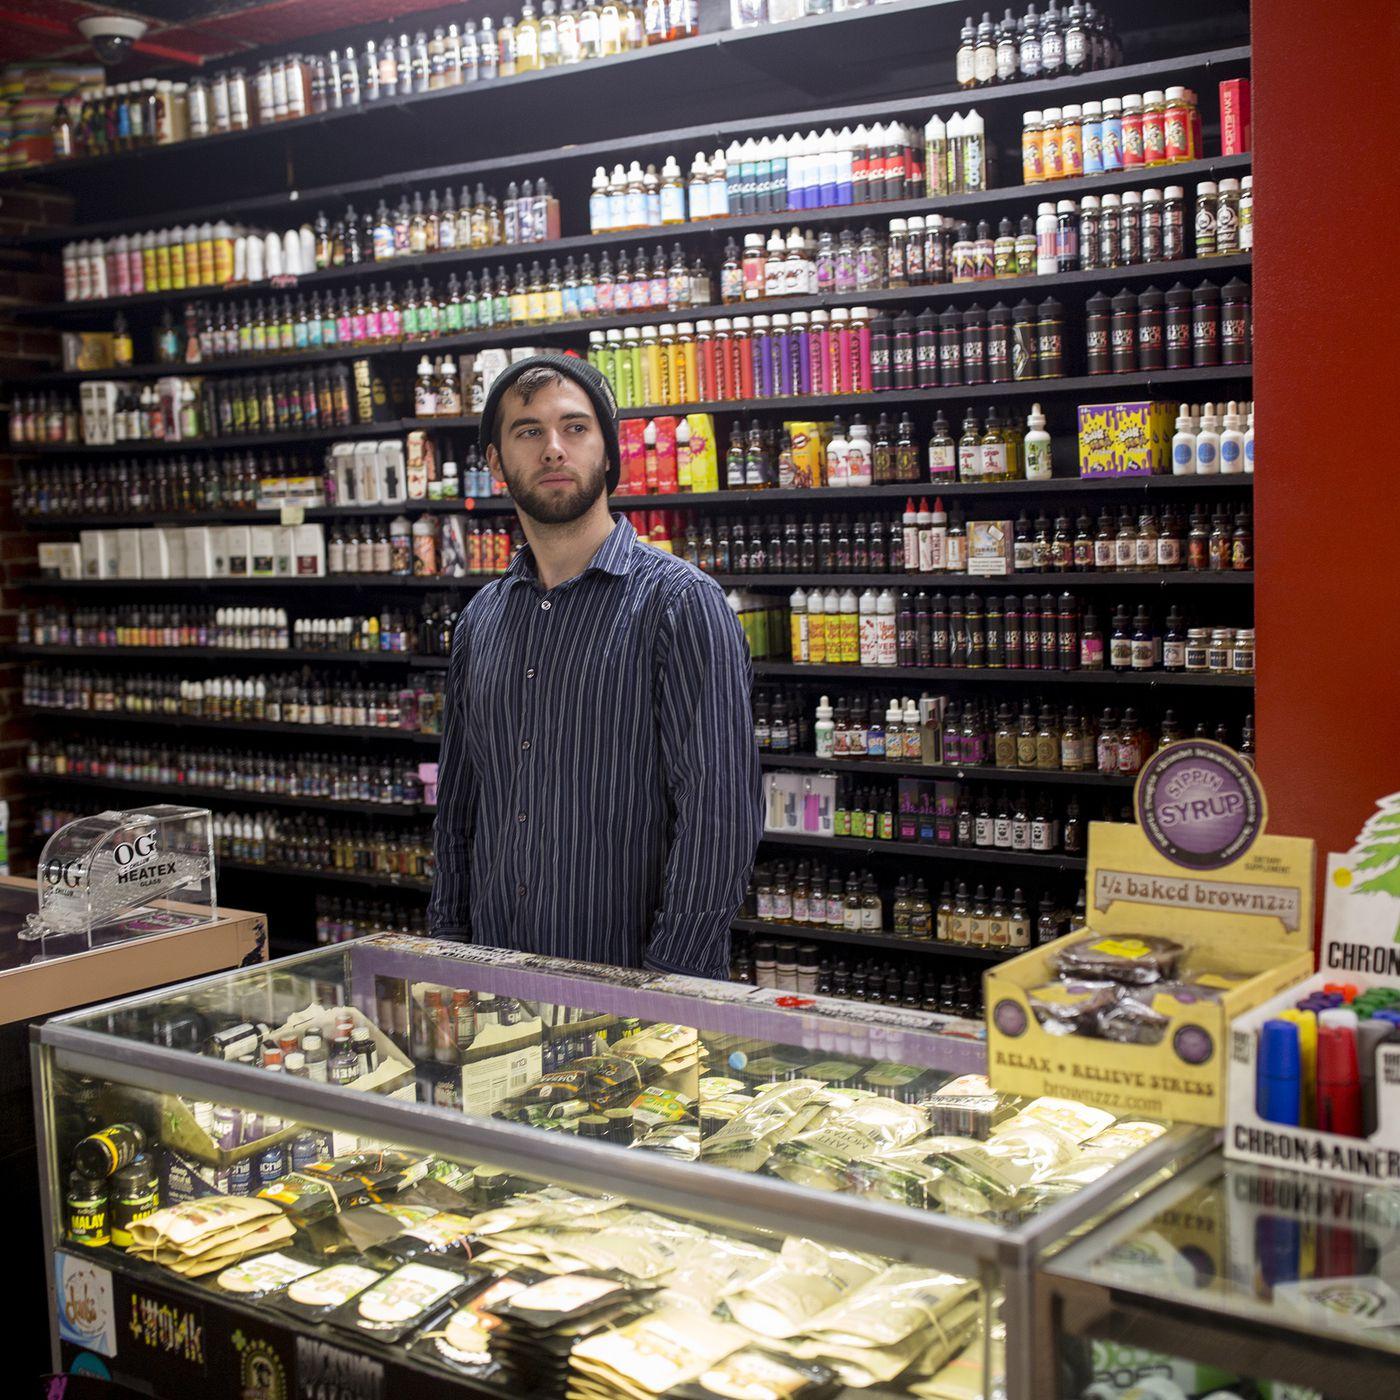 Vape stores, e-liquid brands, and mods: inside the vape life aesthetic - Vox